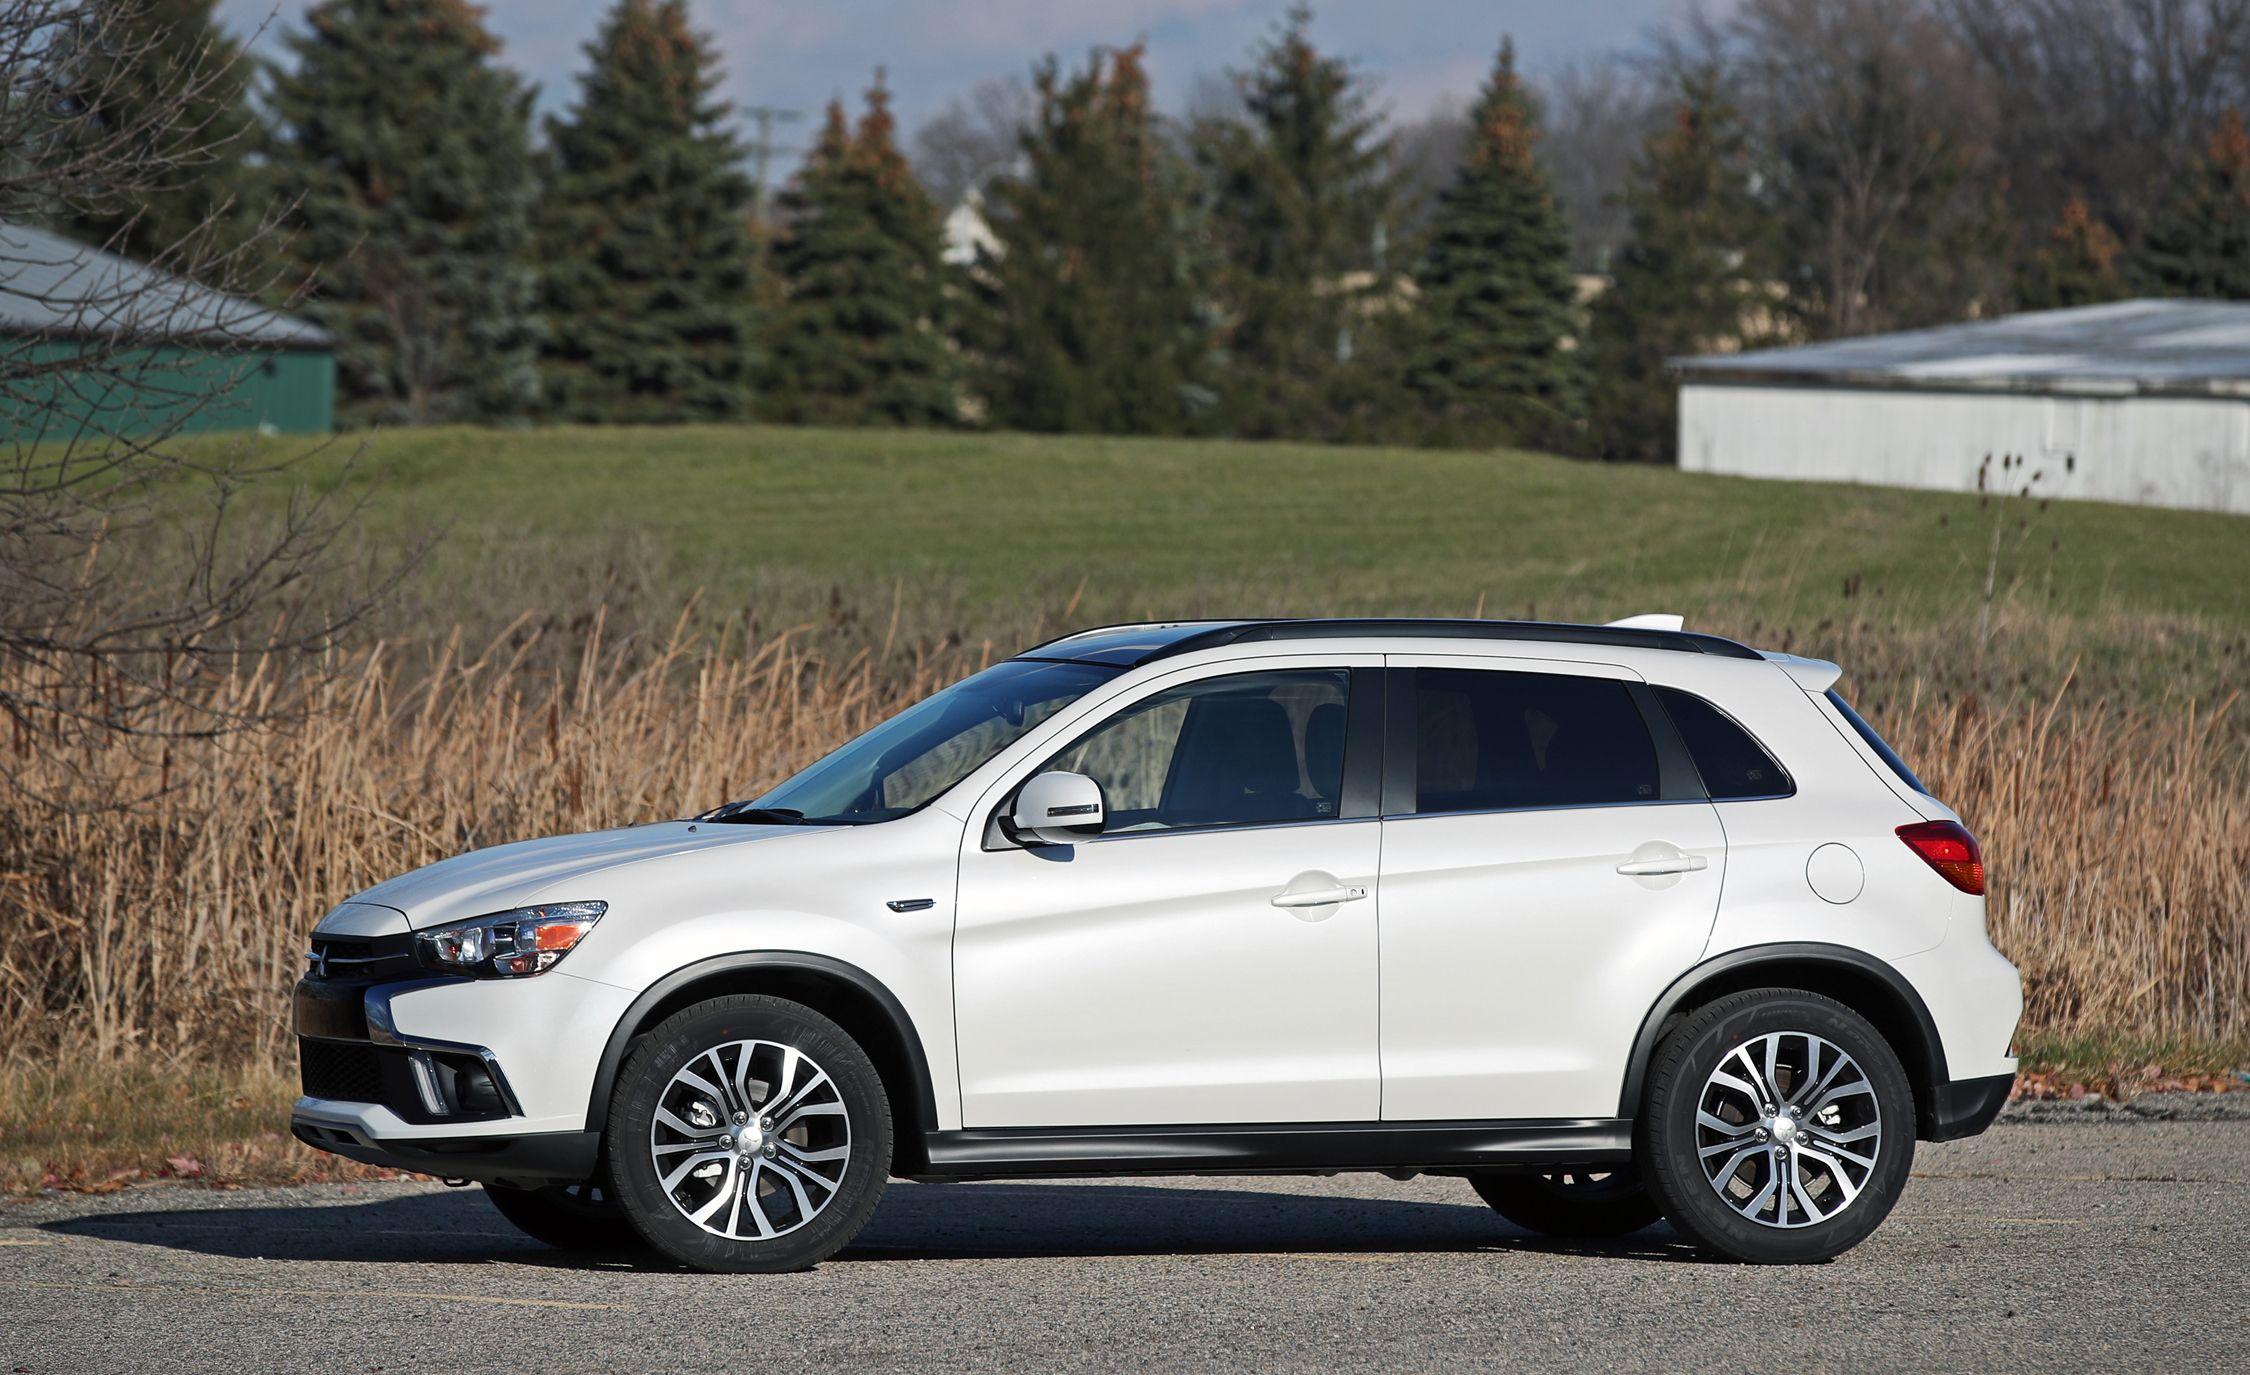 Mitsubishi Outlander Sport Reviews   Mitsubishi Outlander Sport Price,  Photos, and Specs   Car and Driver